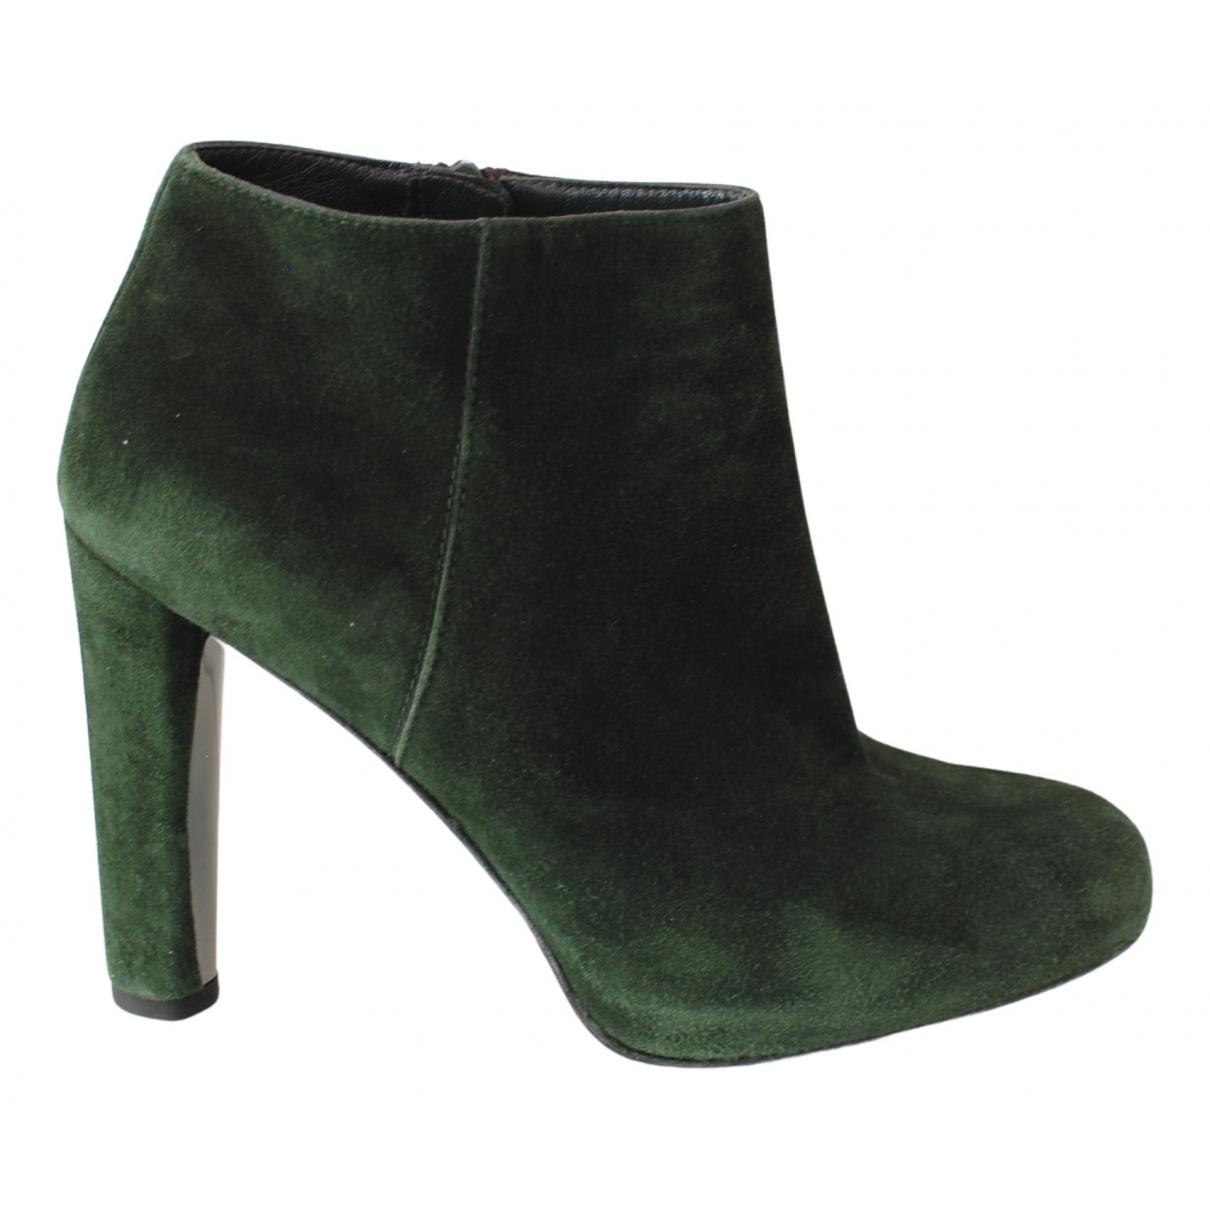 Stuart Weitzman N Green Suede Ankle boots for Women 39 EU